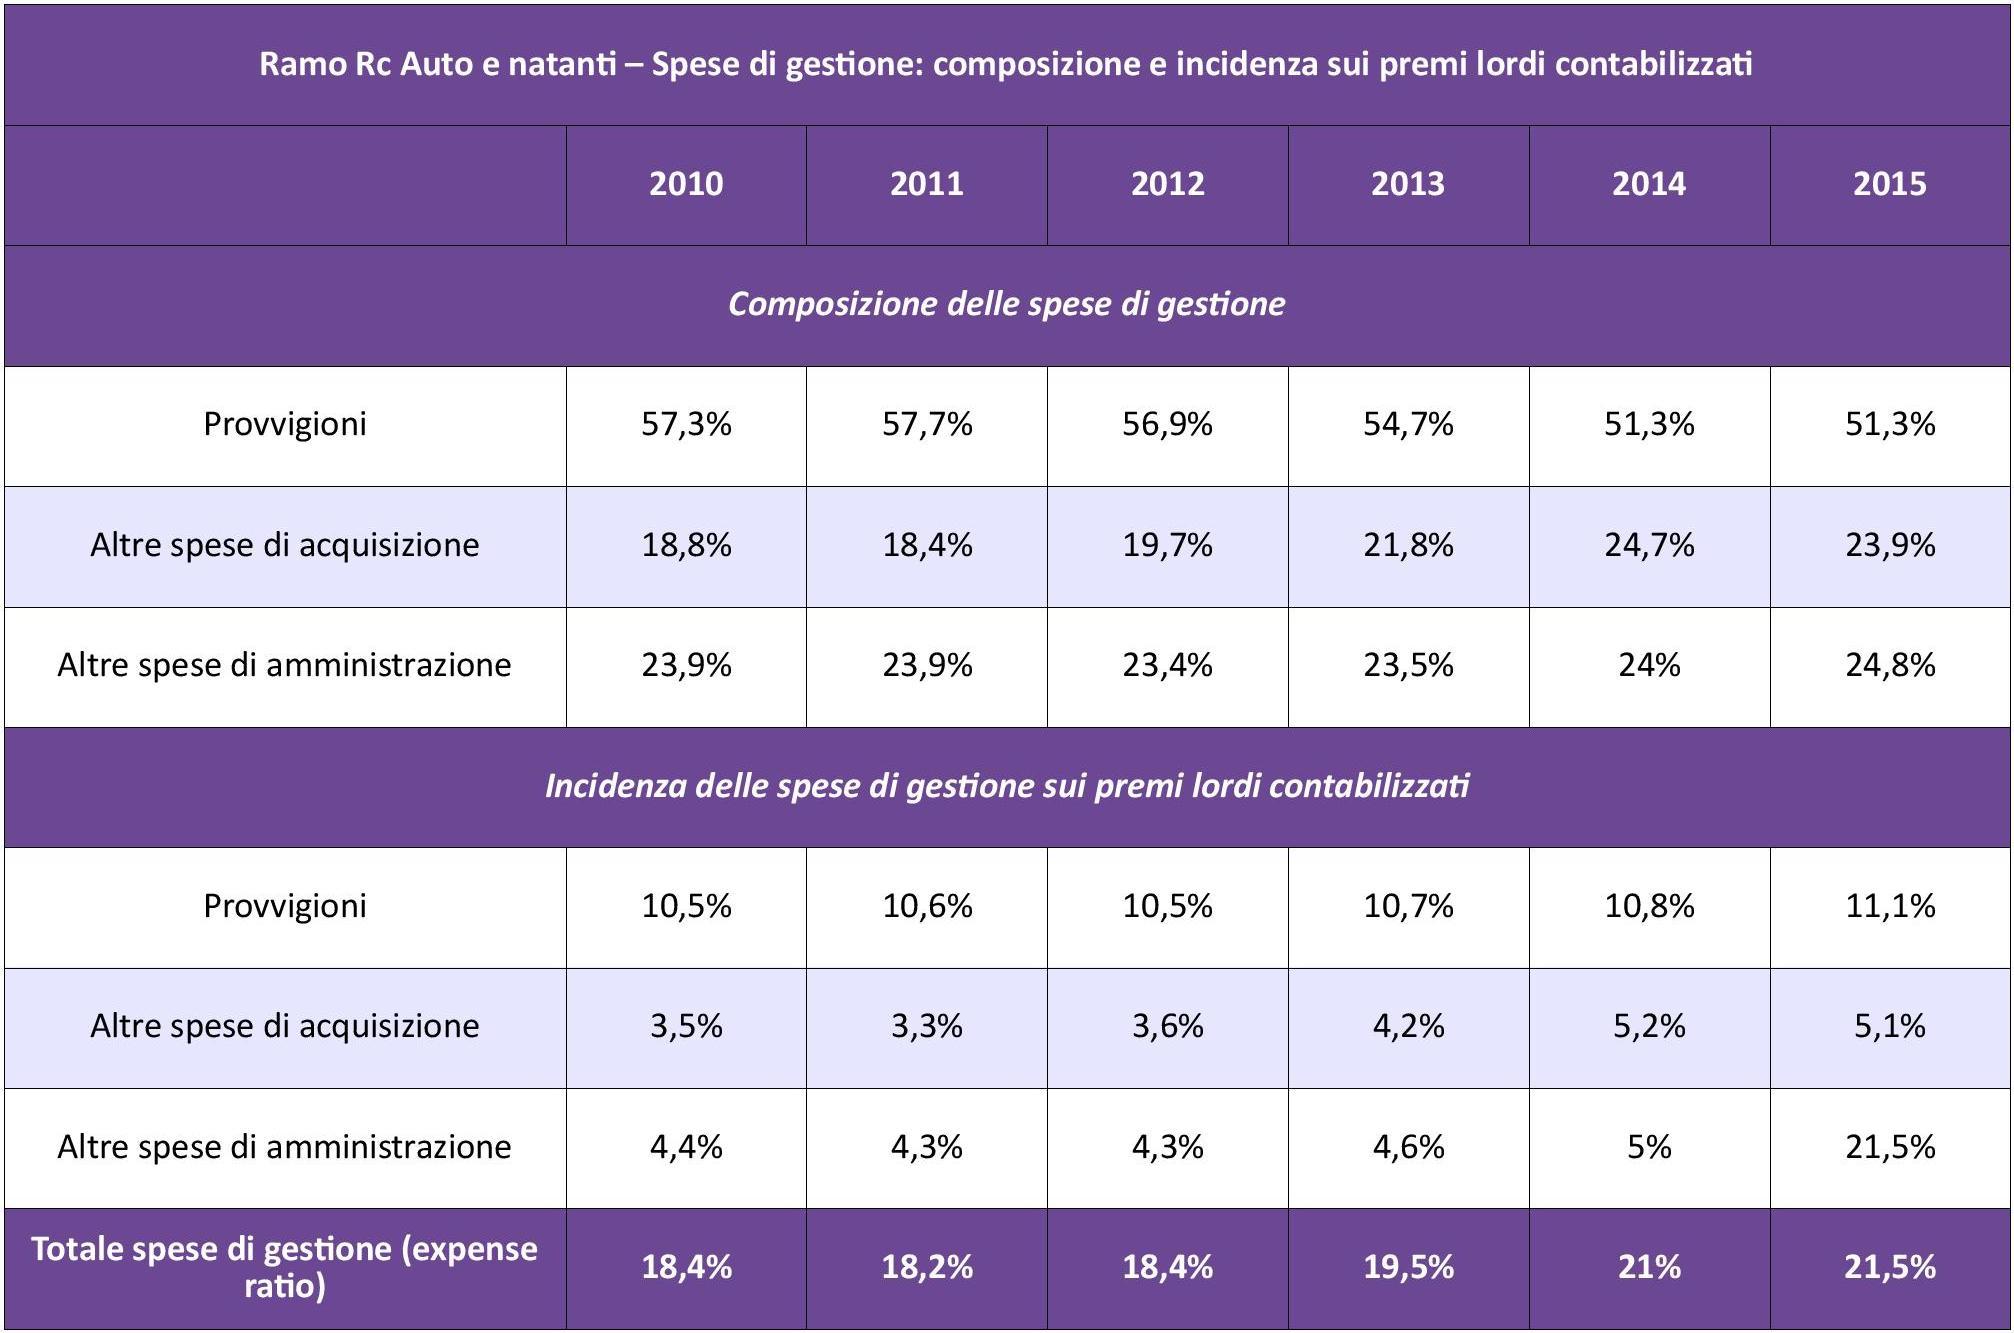 IVASS - Statistiche Auto 2015 - Tab. 2 - Spese gestione IMC